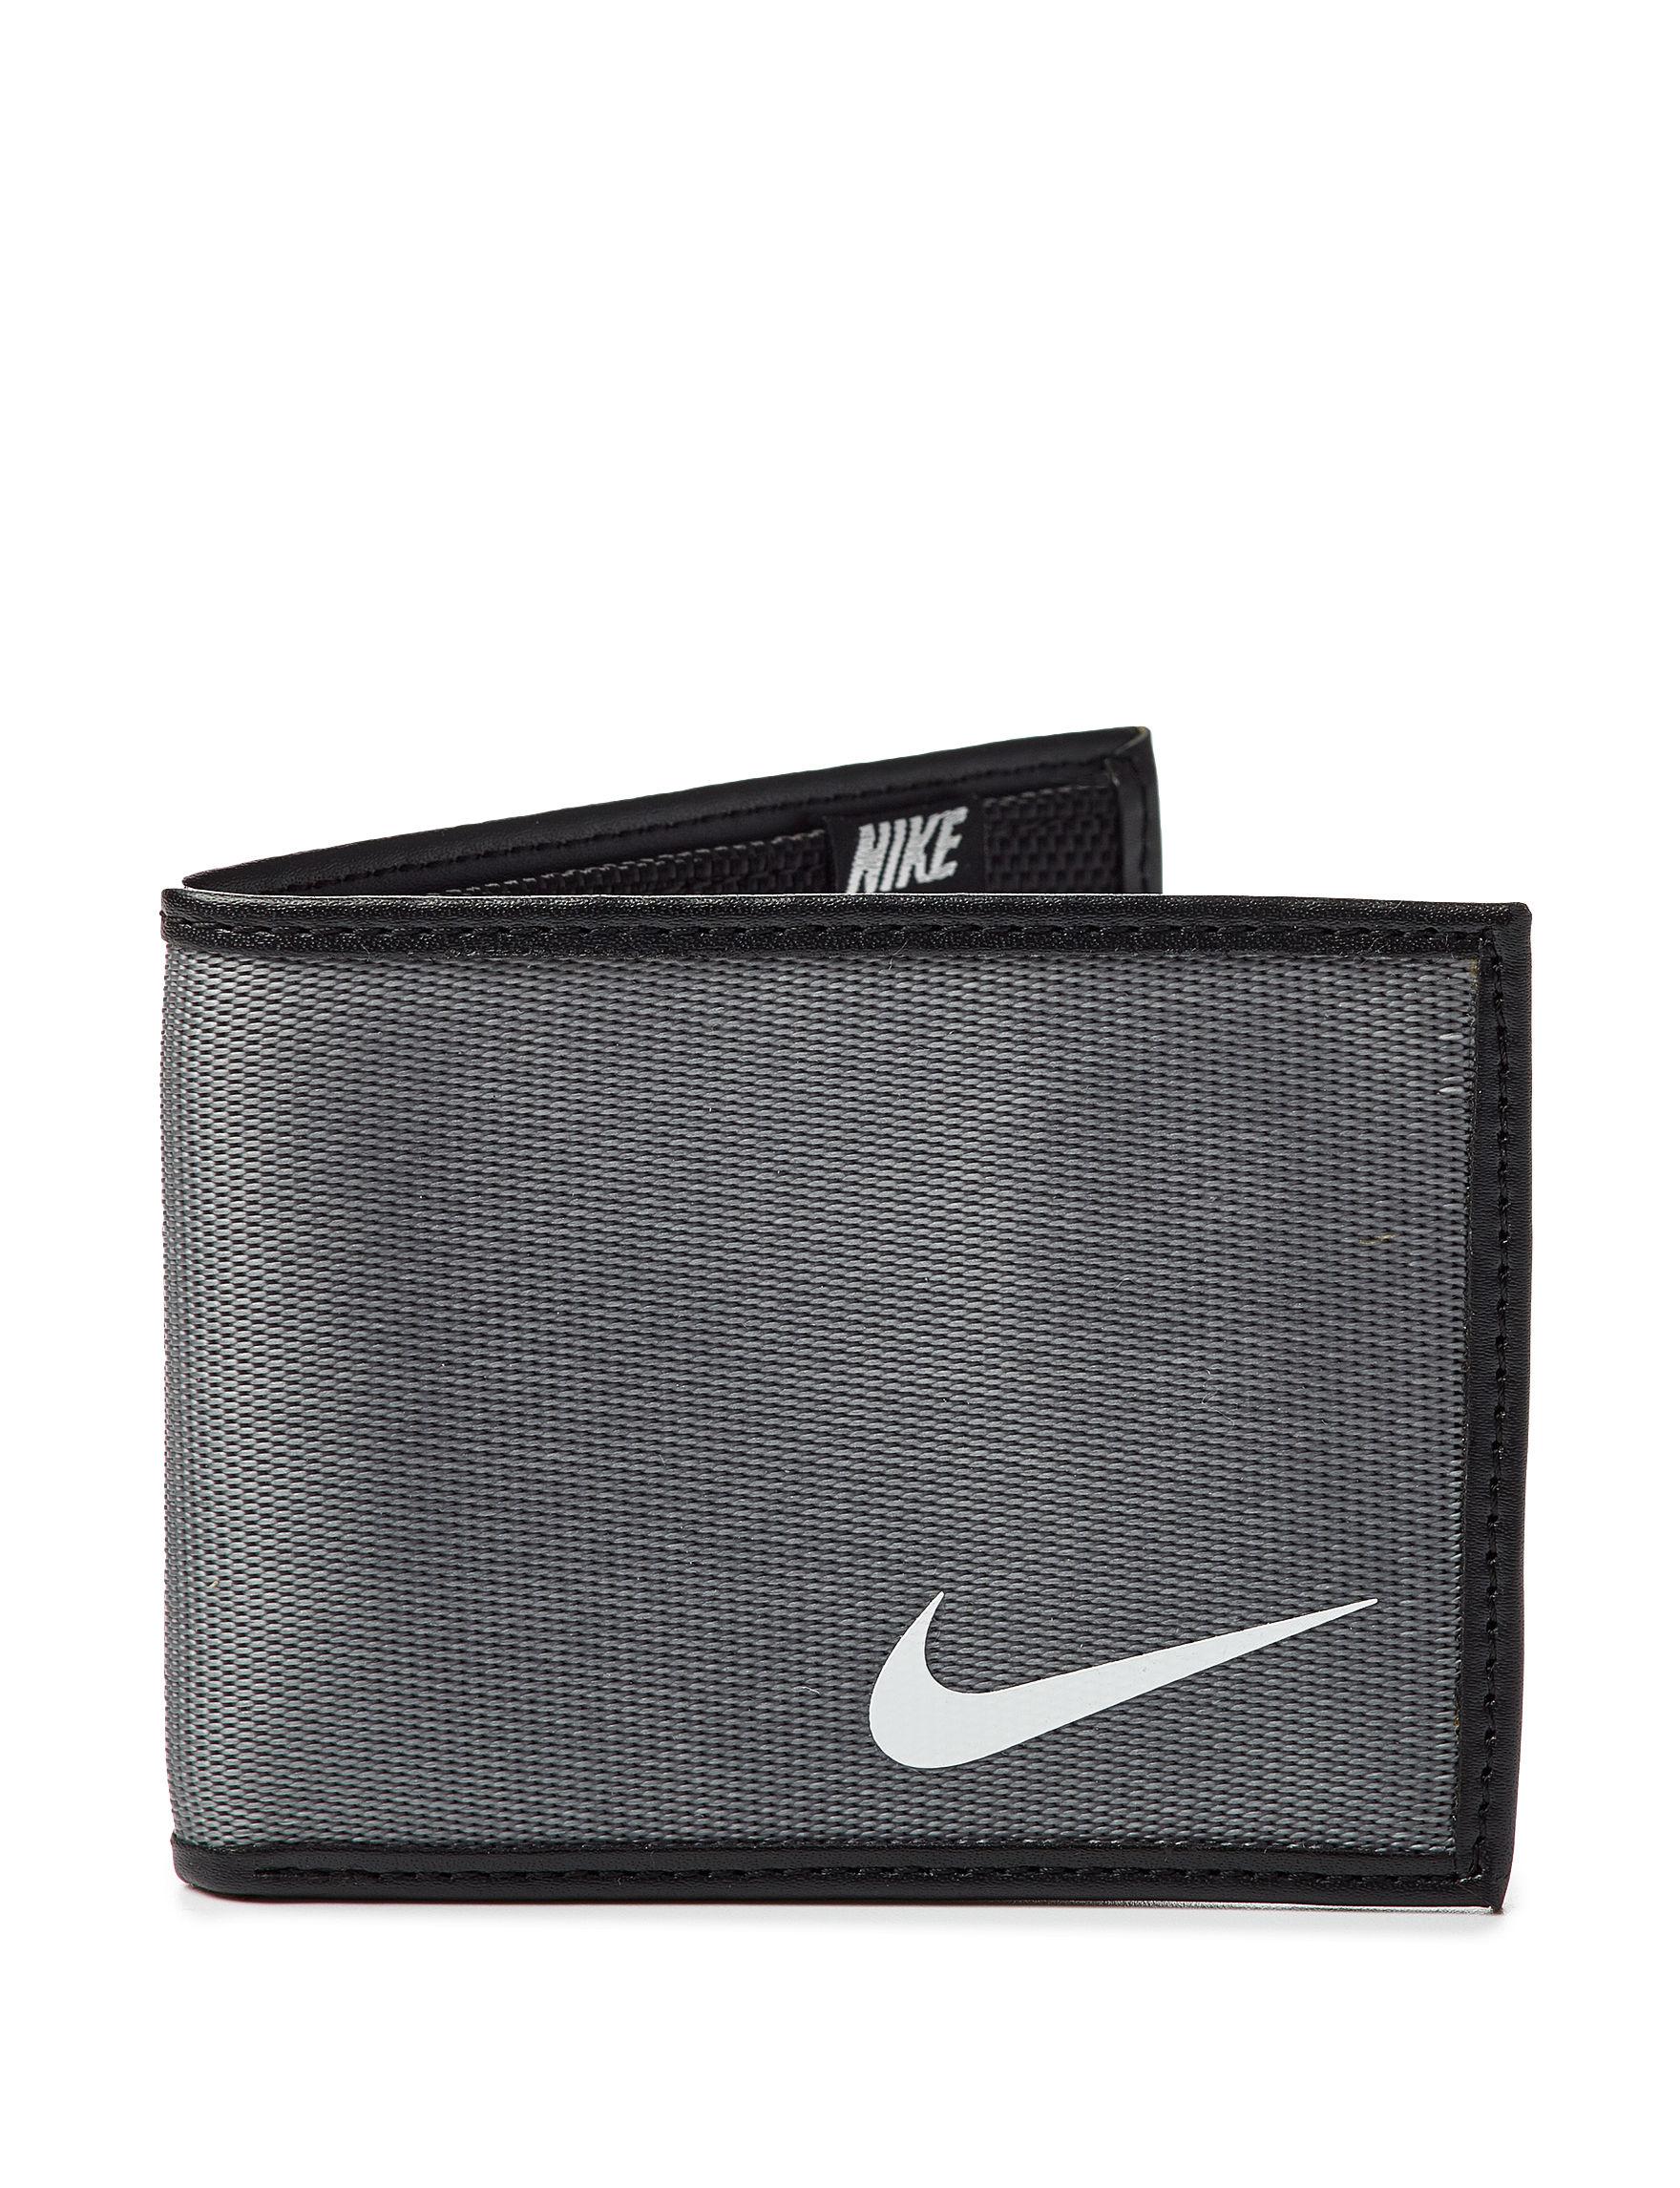 Nike Charcoal Bi-fold Wallets